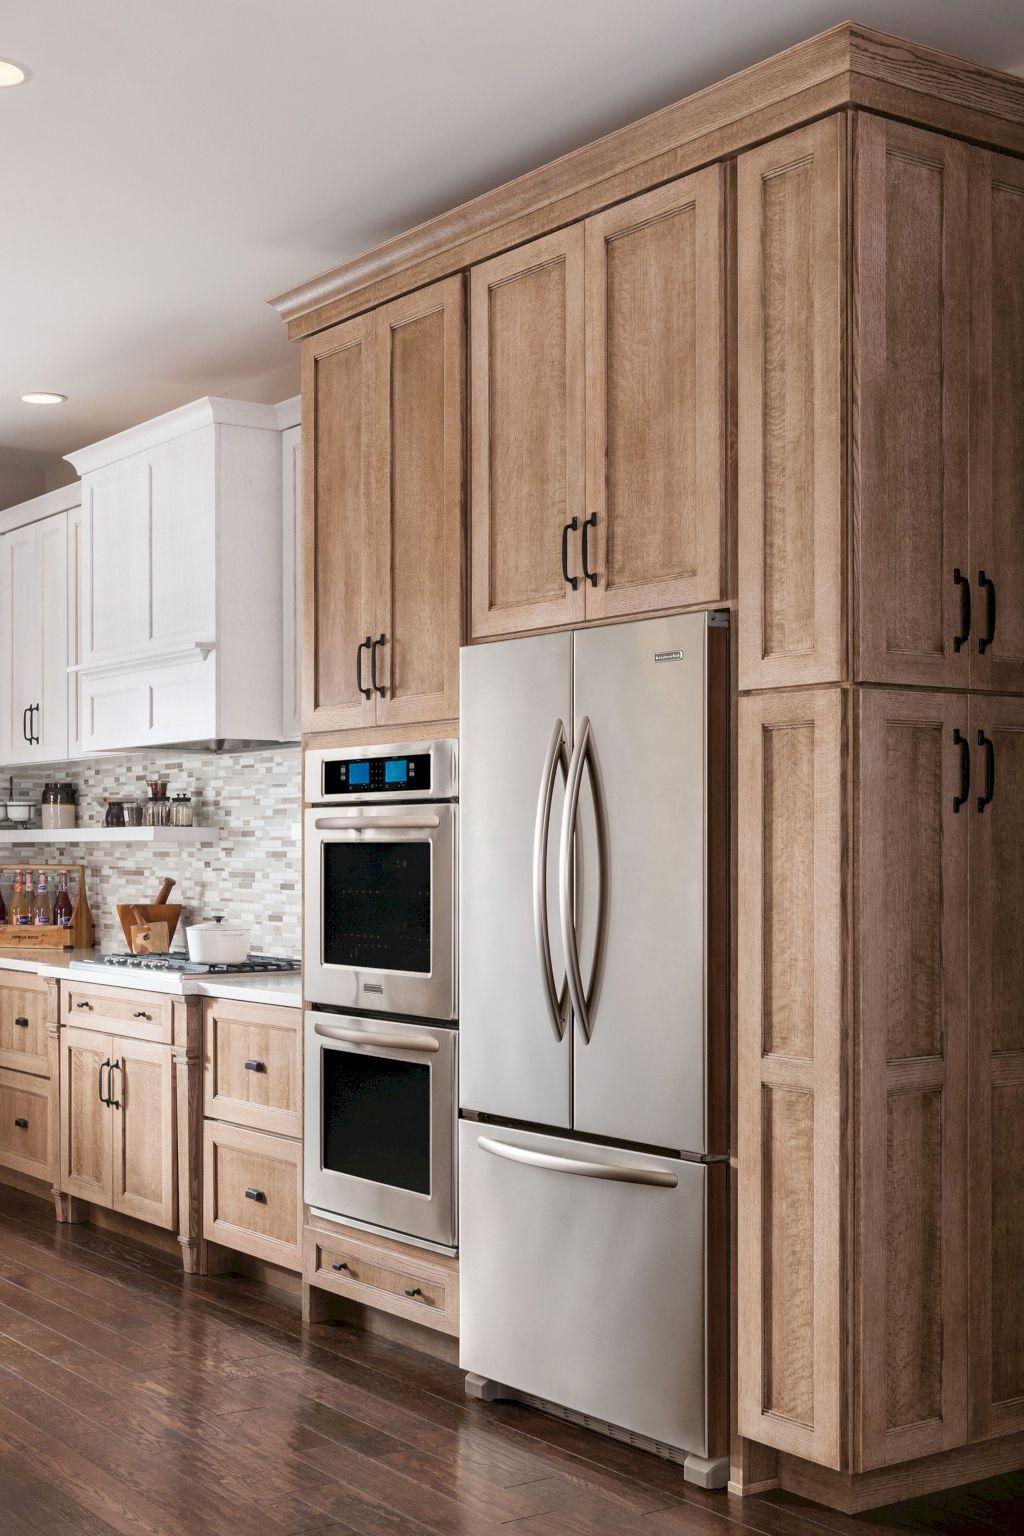 gorgeous kitchen cabinets design and decor ideas kitchen